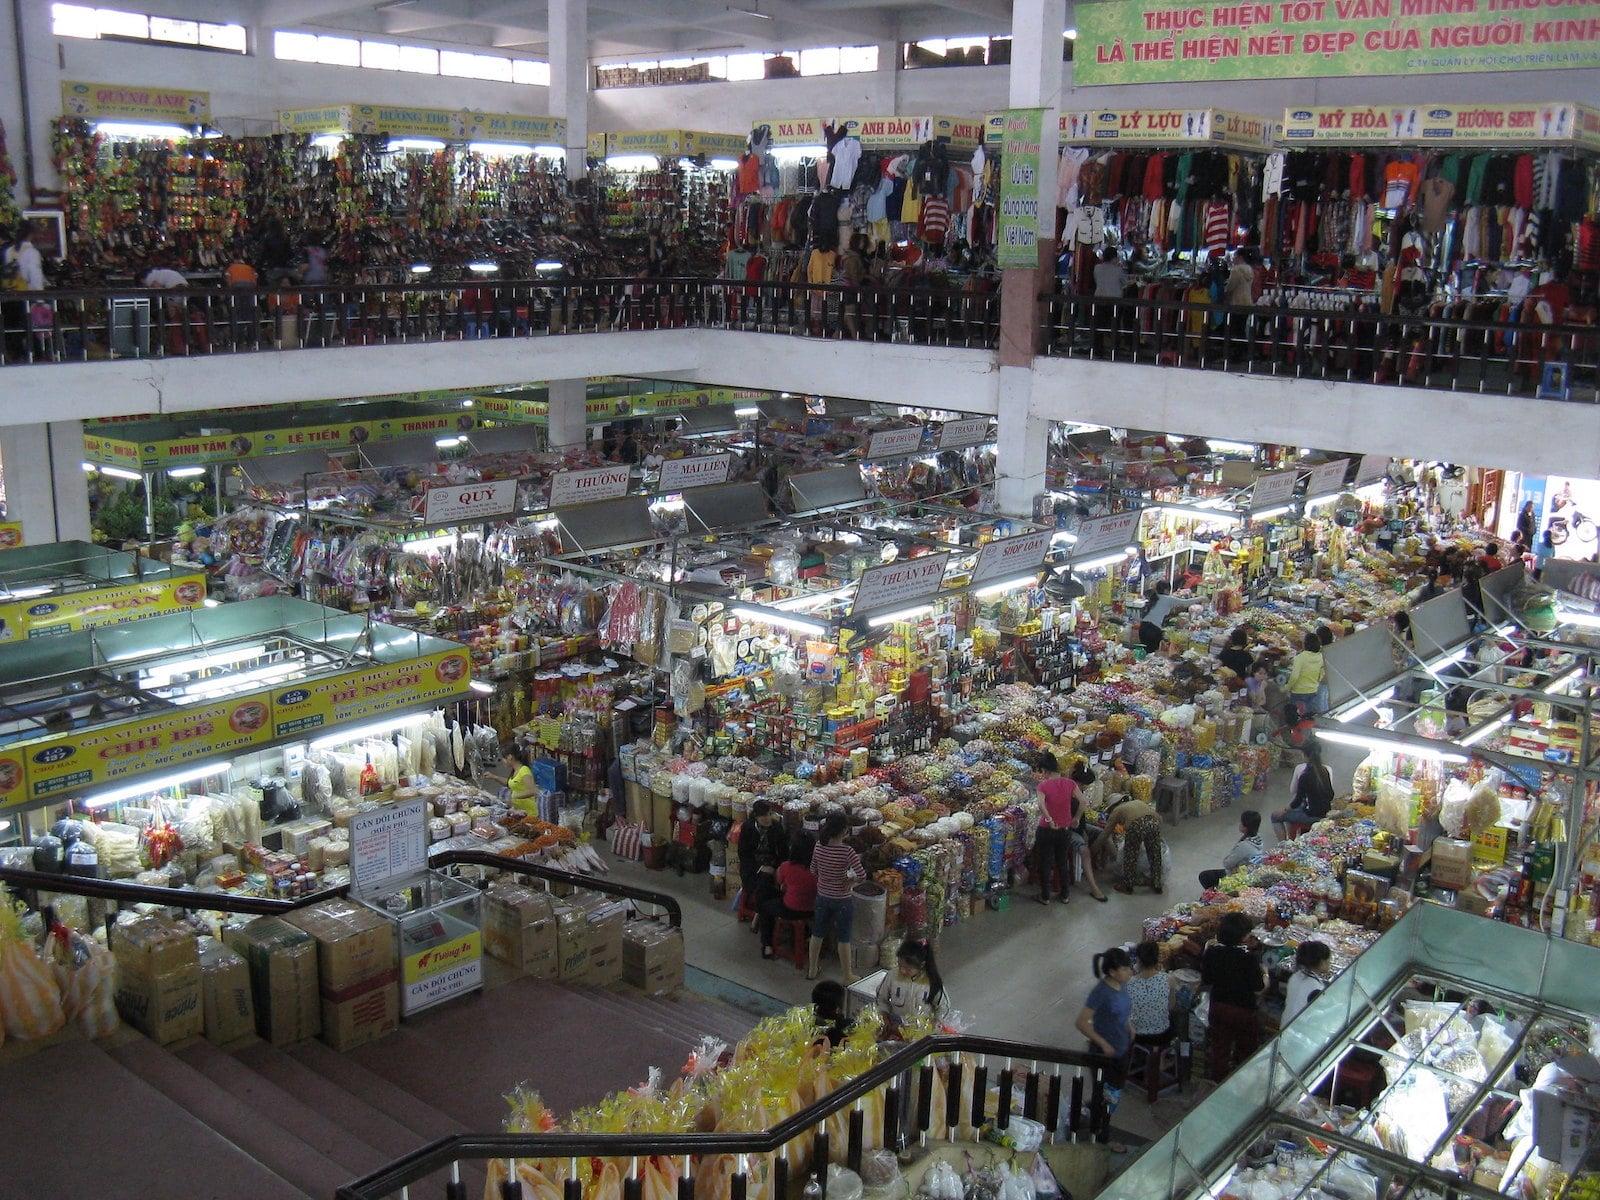 Image of the interior of Han Market in Da Nang, Vietnam